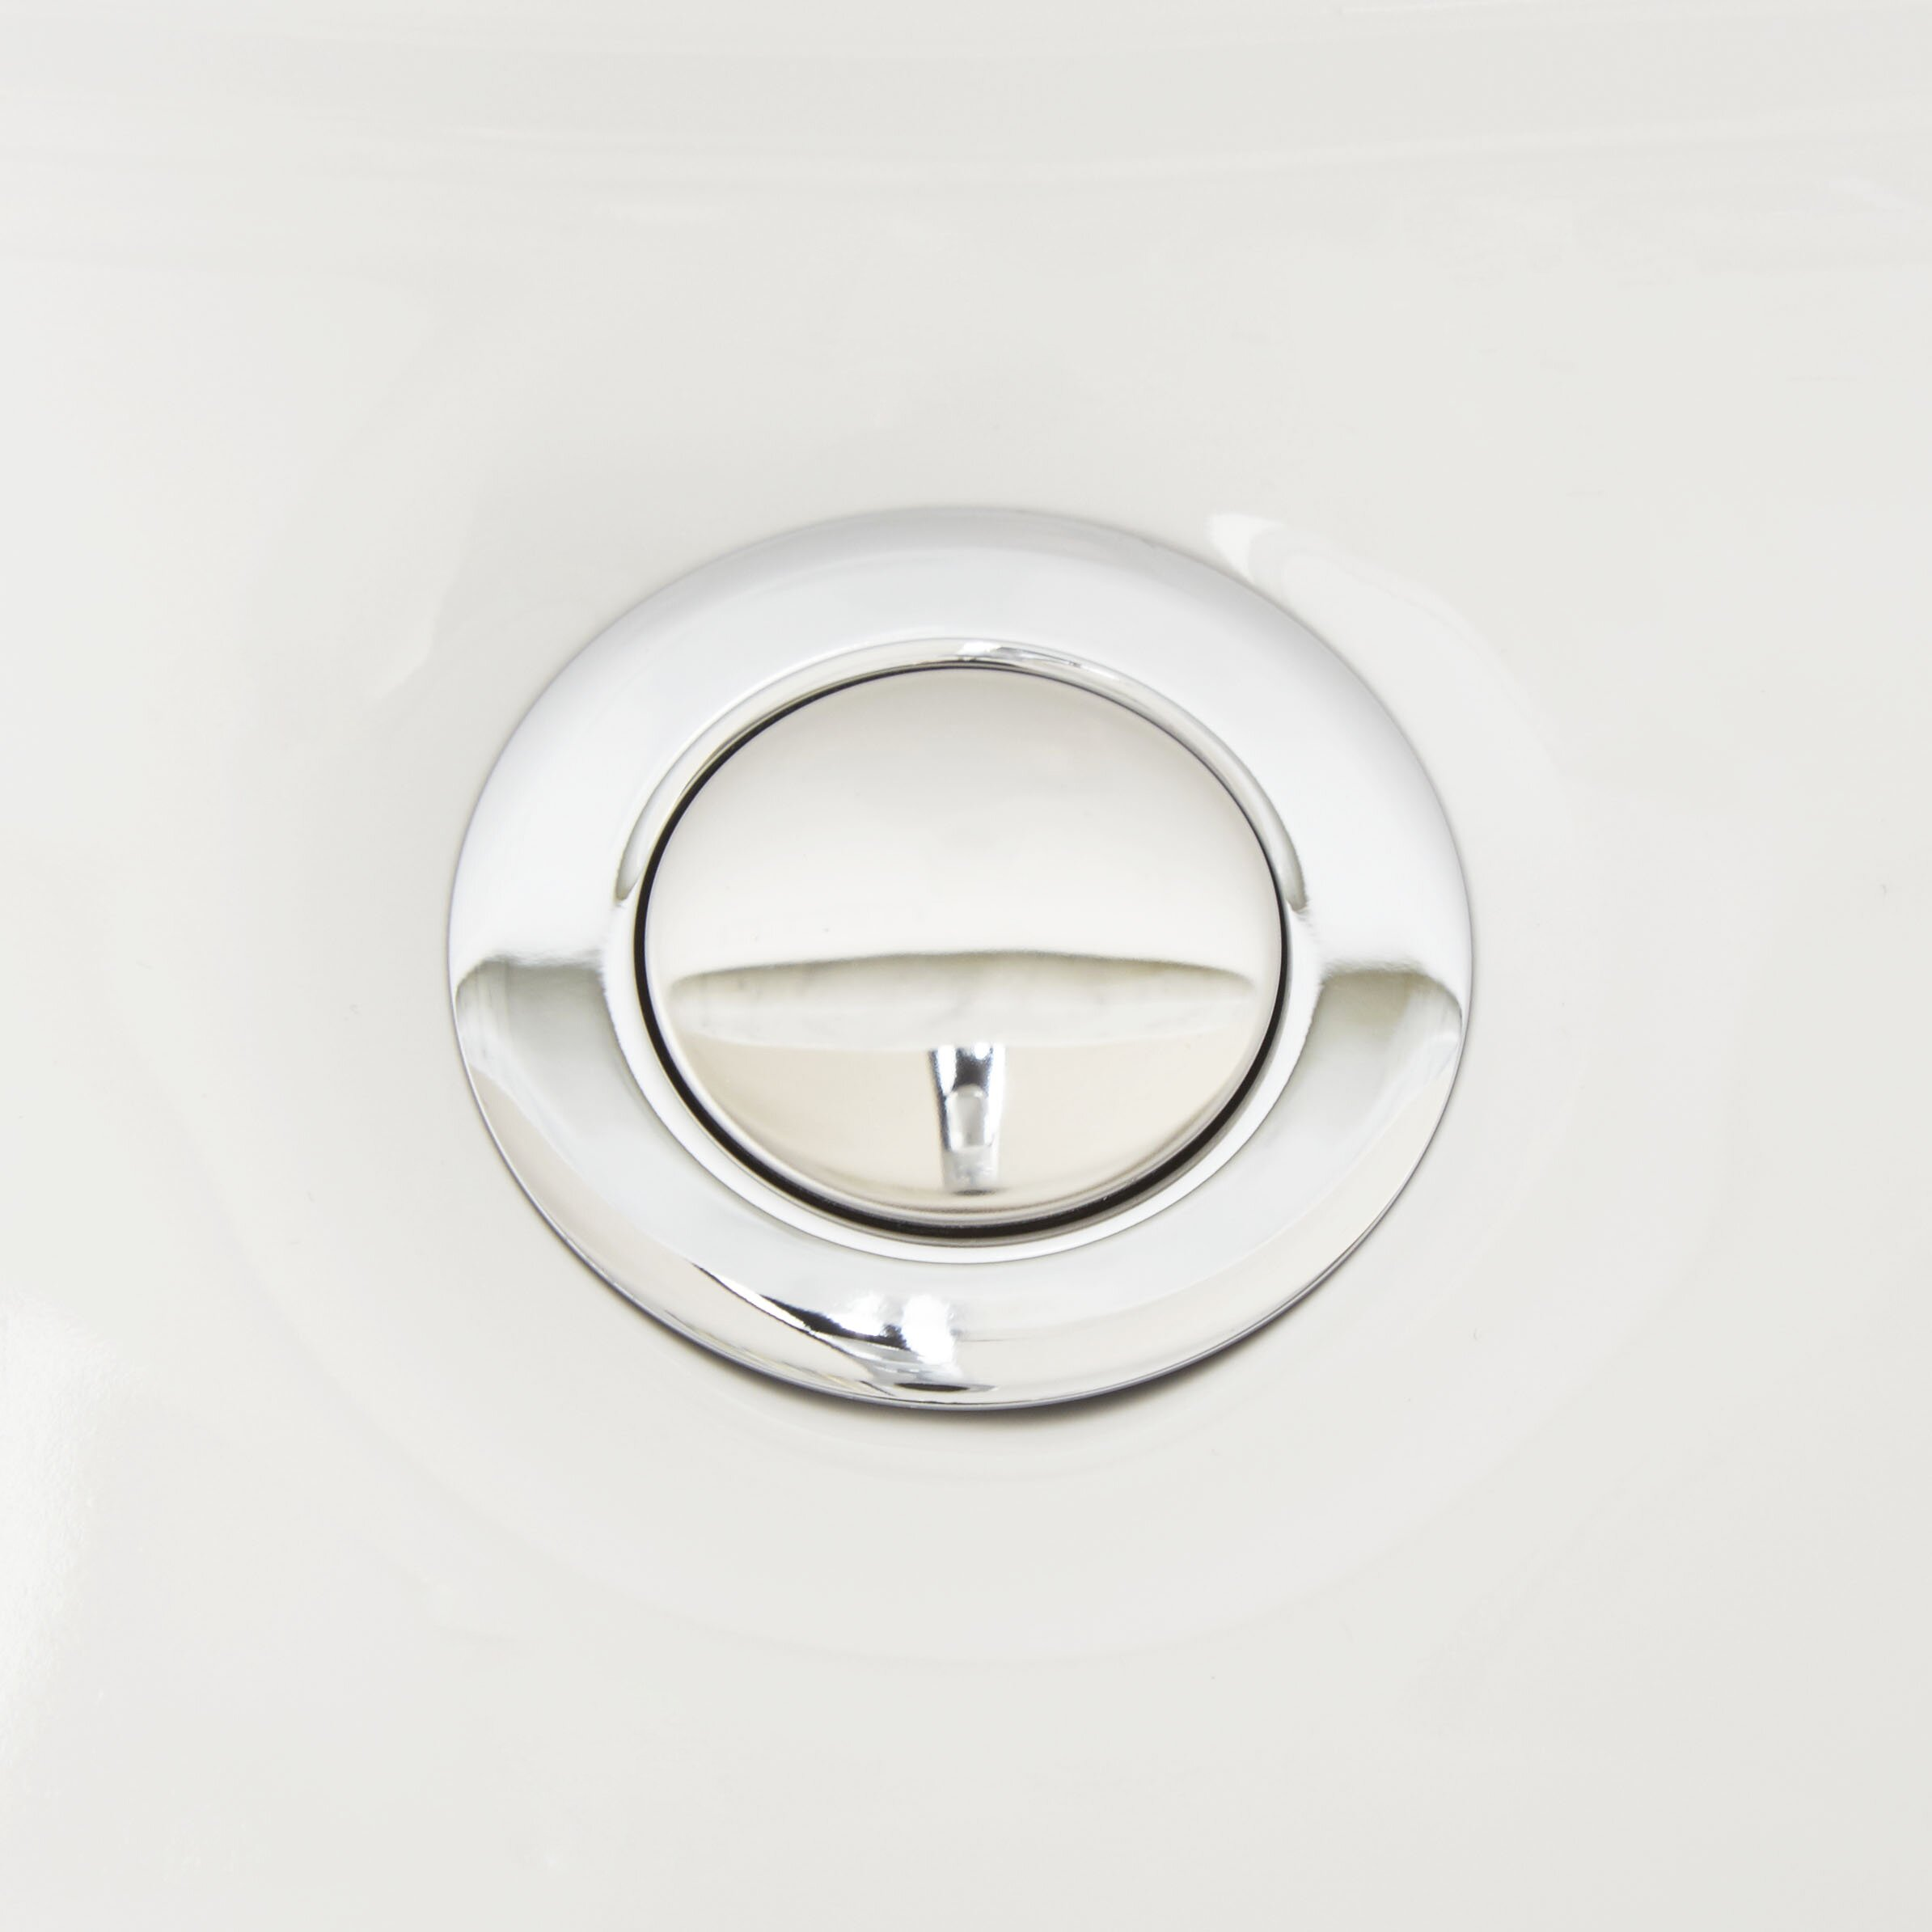 moen brantford double handle widespread standard bathroom moen kitchen faucet aerator assembly m wall decal